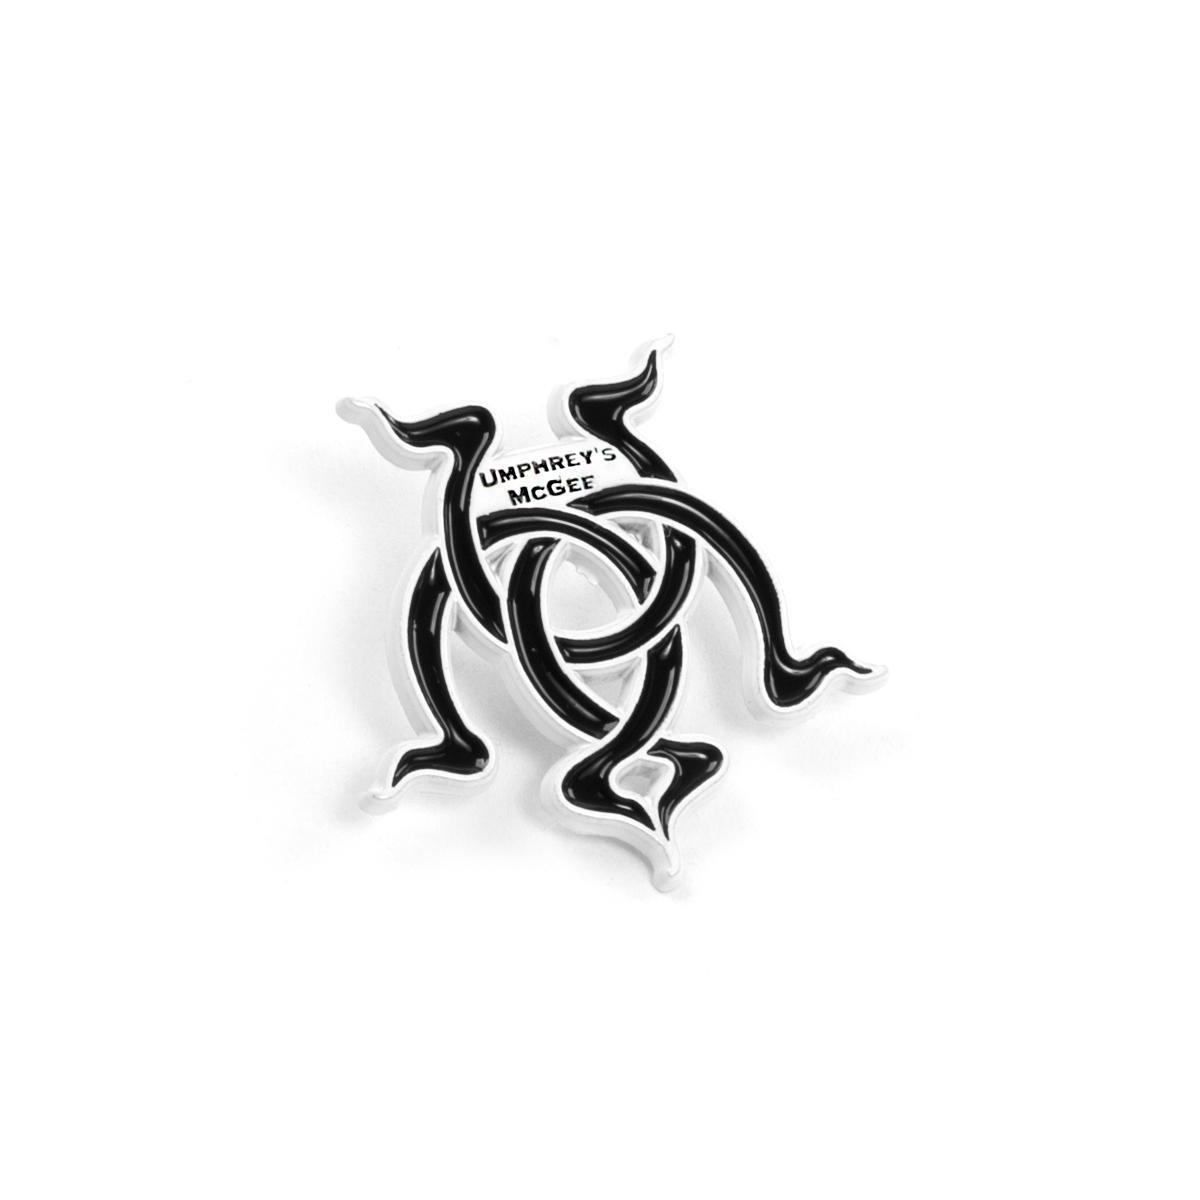 Horseshoe Trifecta Pin